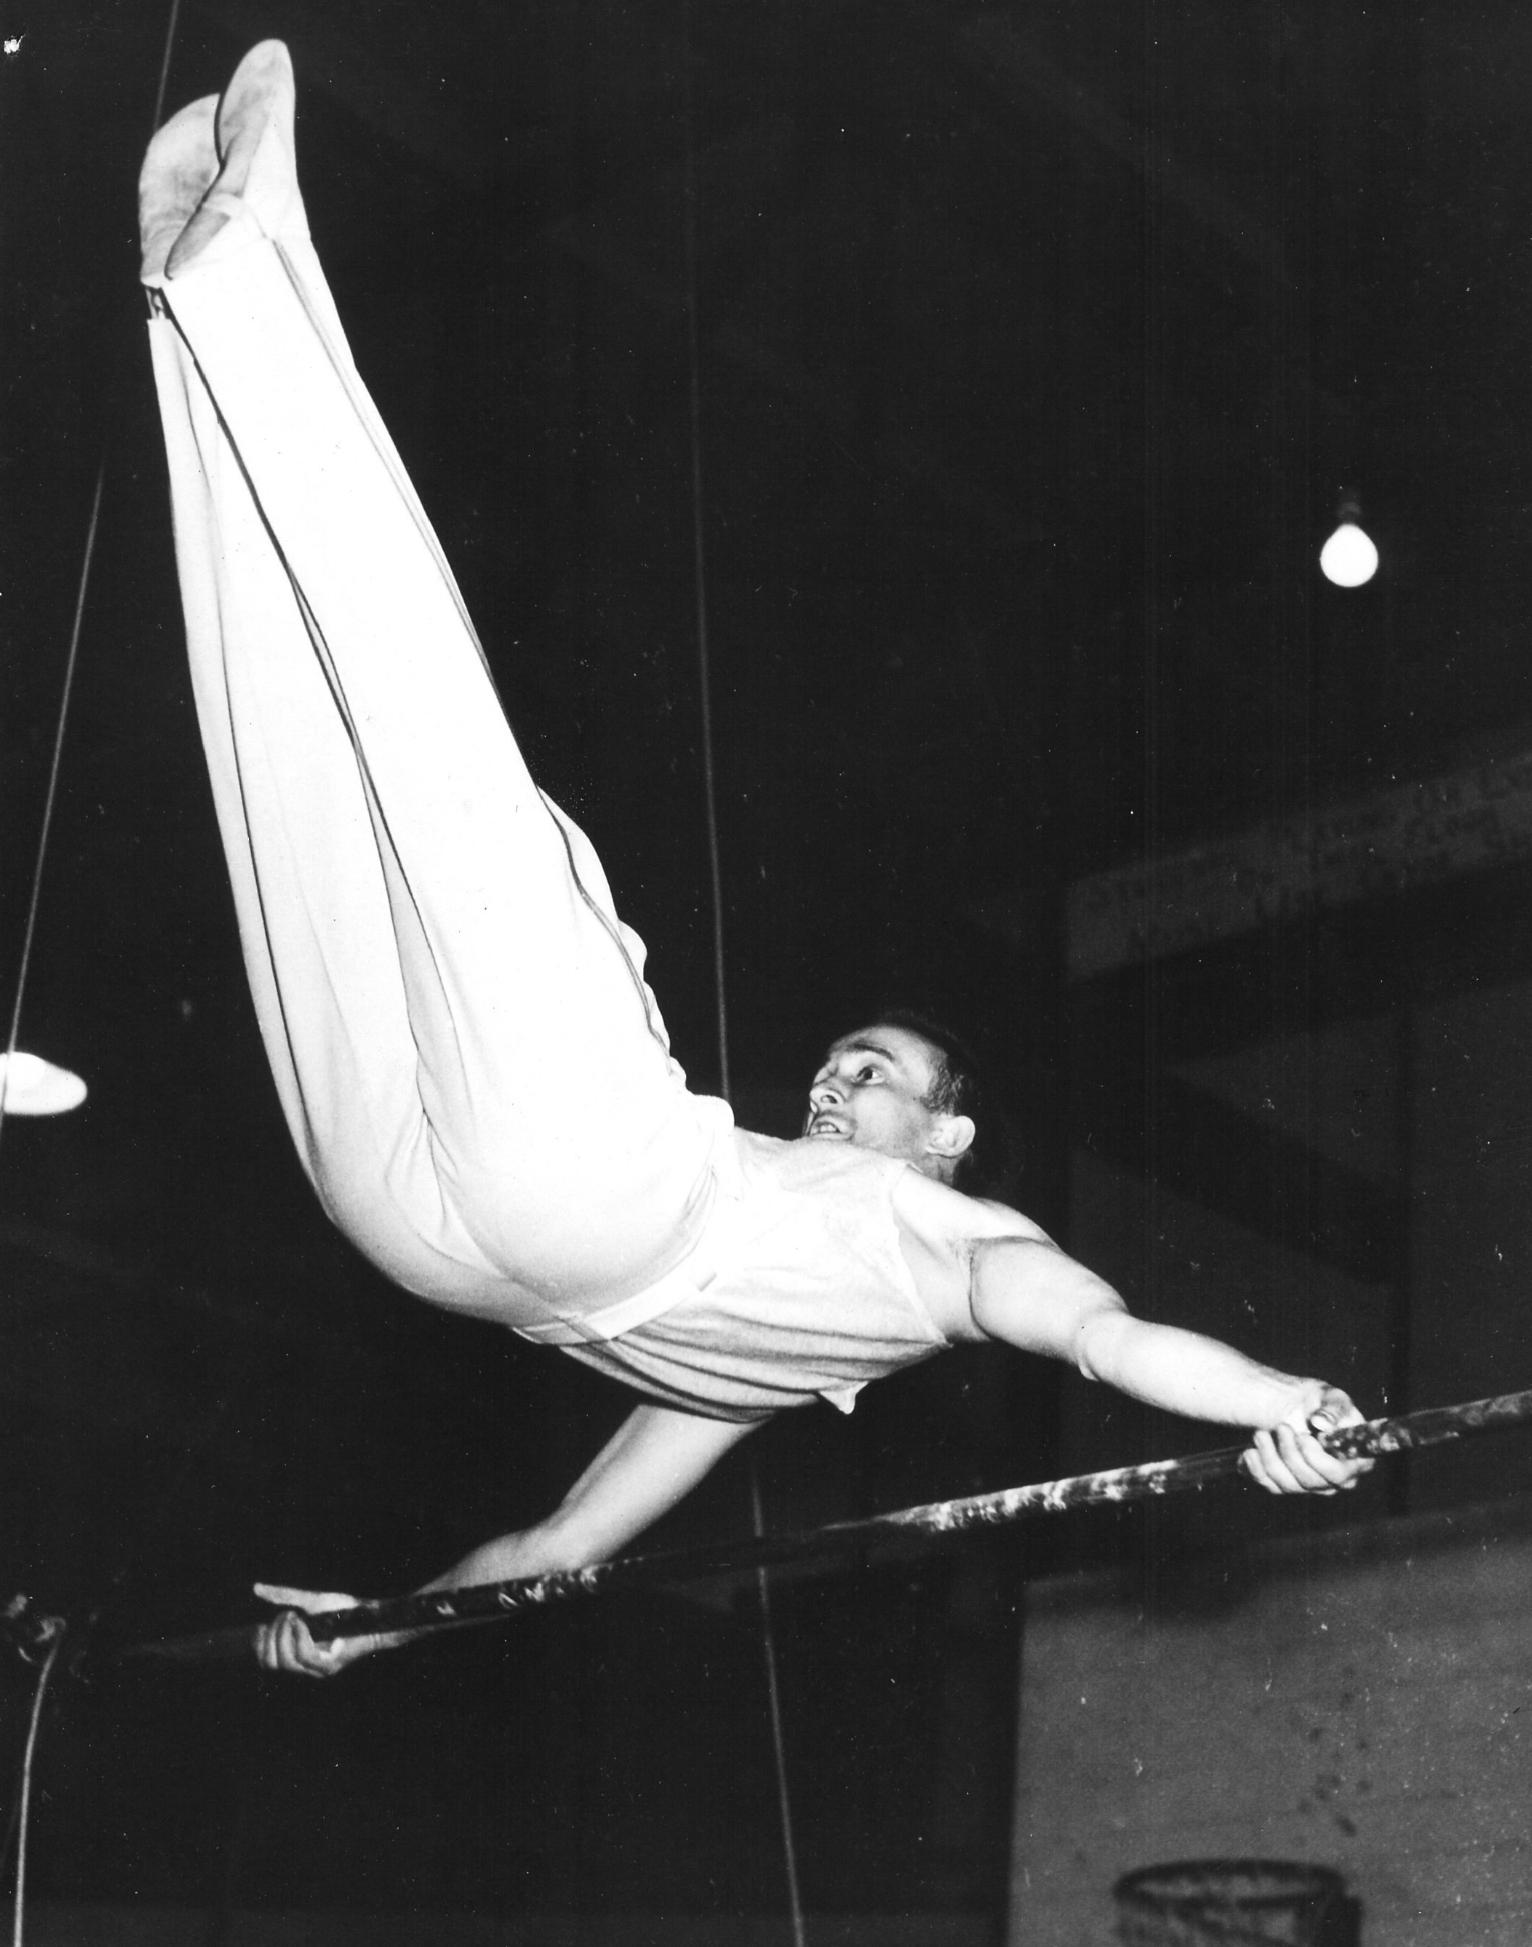 Capt. Charles Pinckney doing an Eagle on the Horizontal Bar (1950)